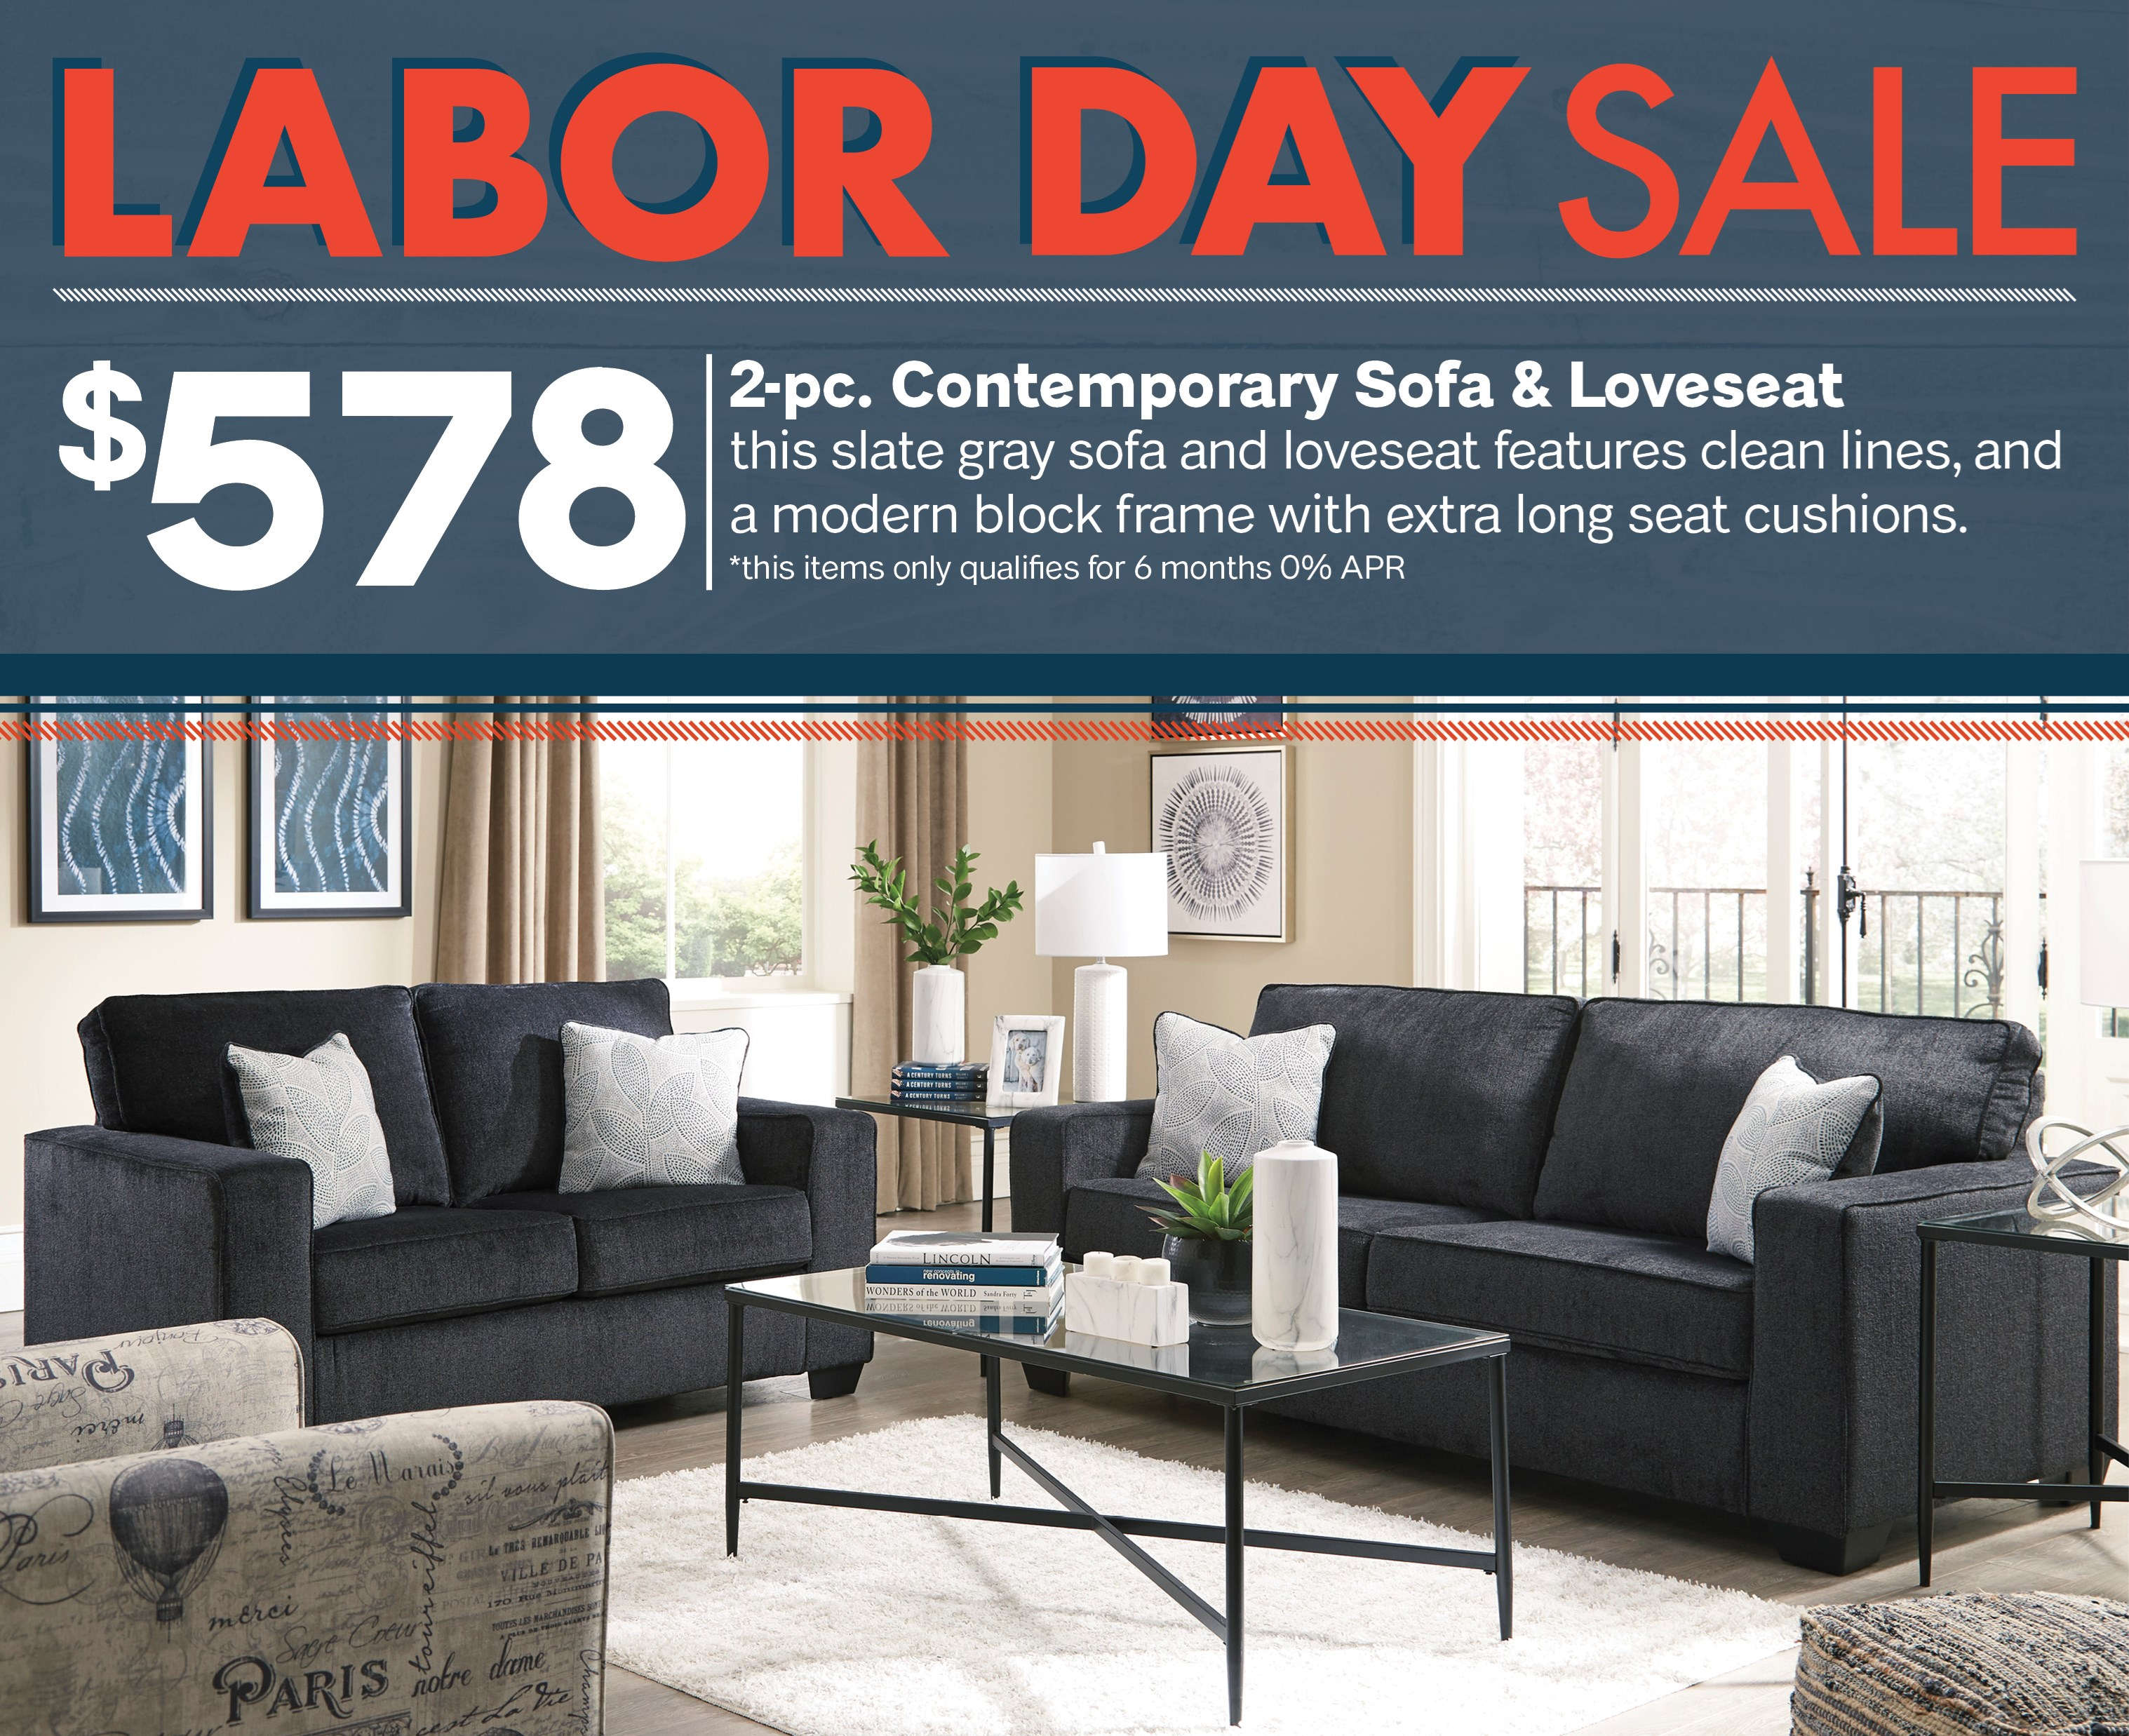 Furniture appliancemart labor day sale